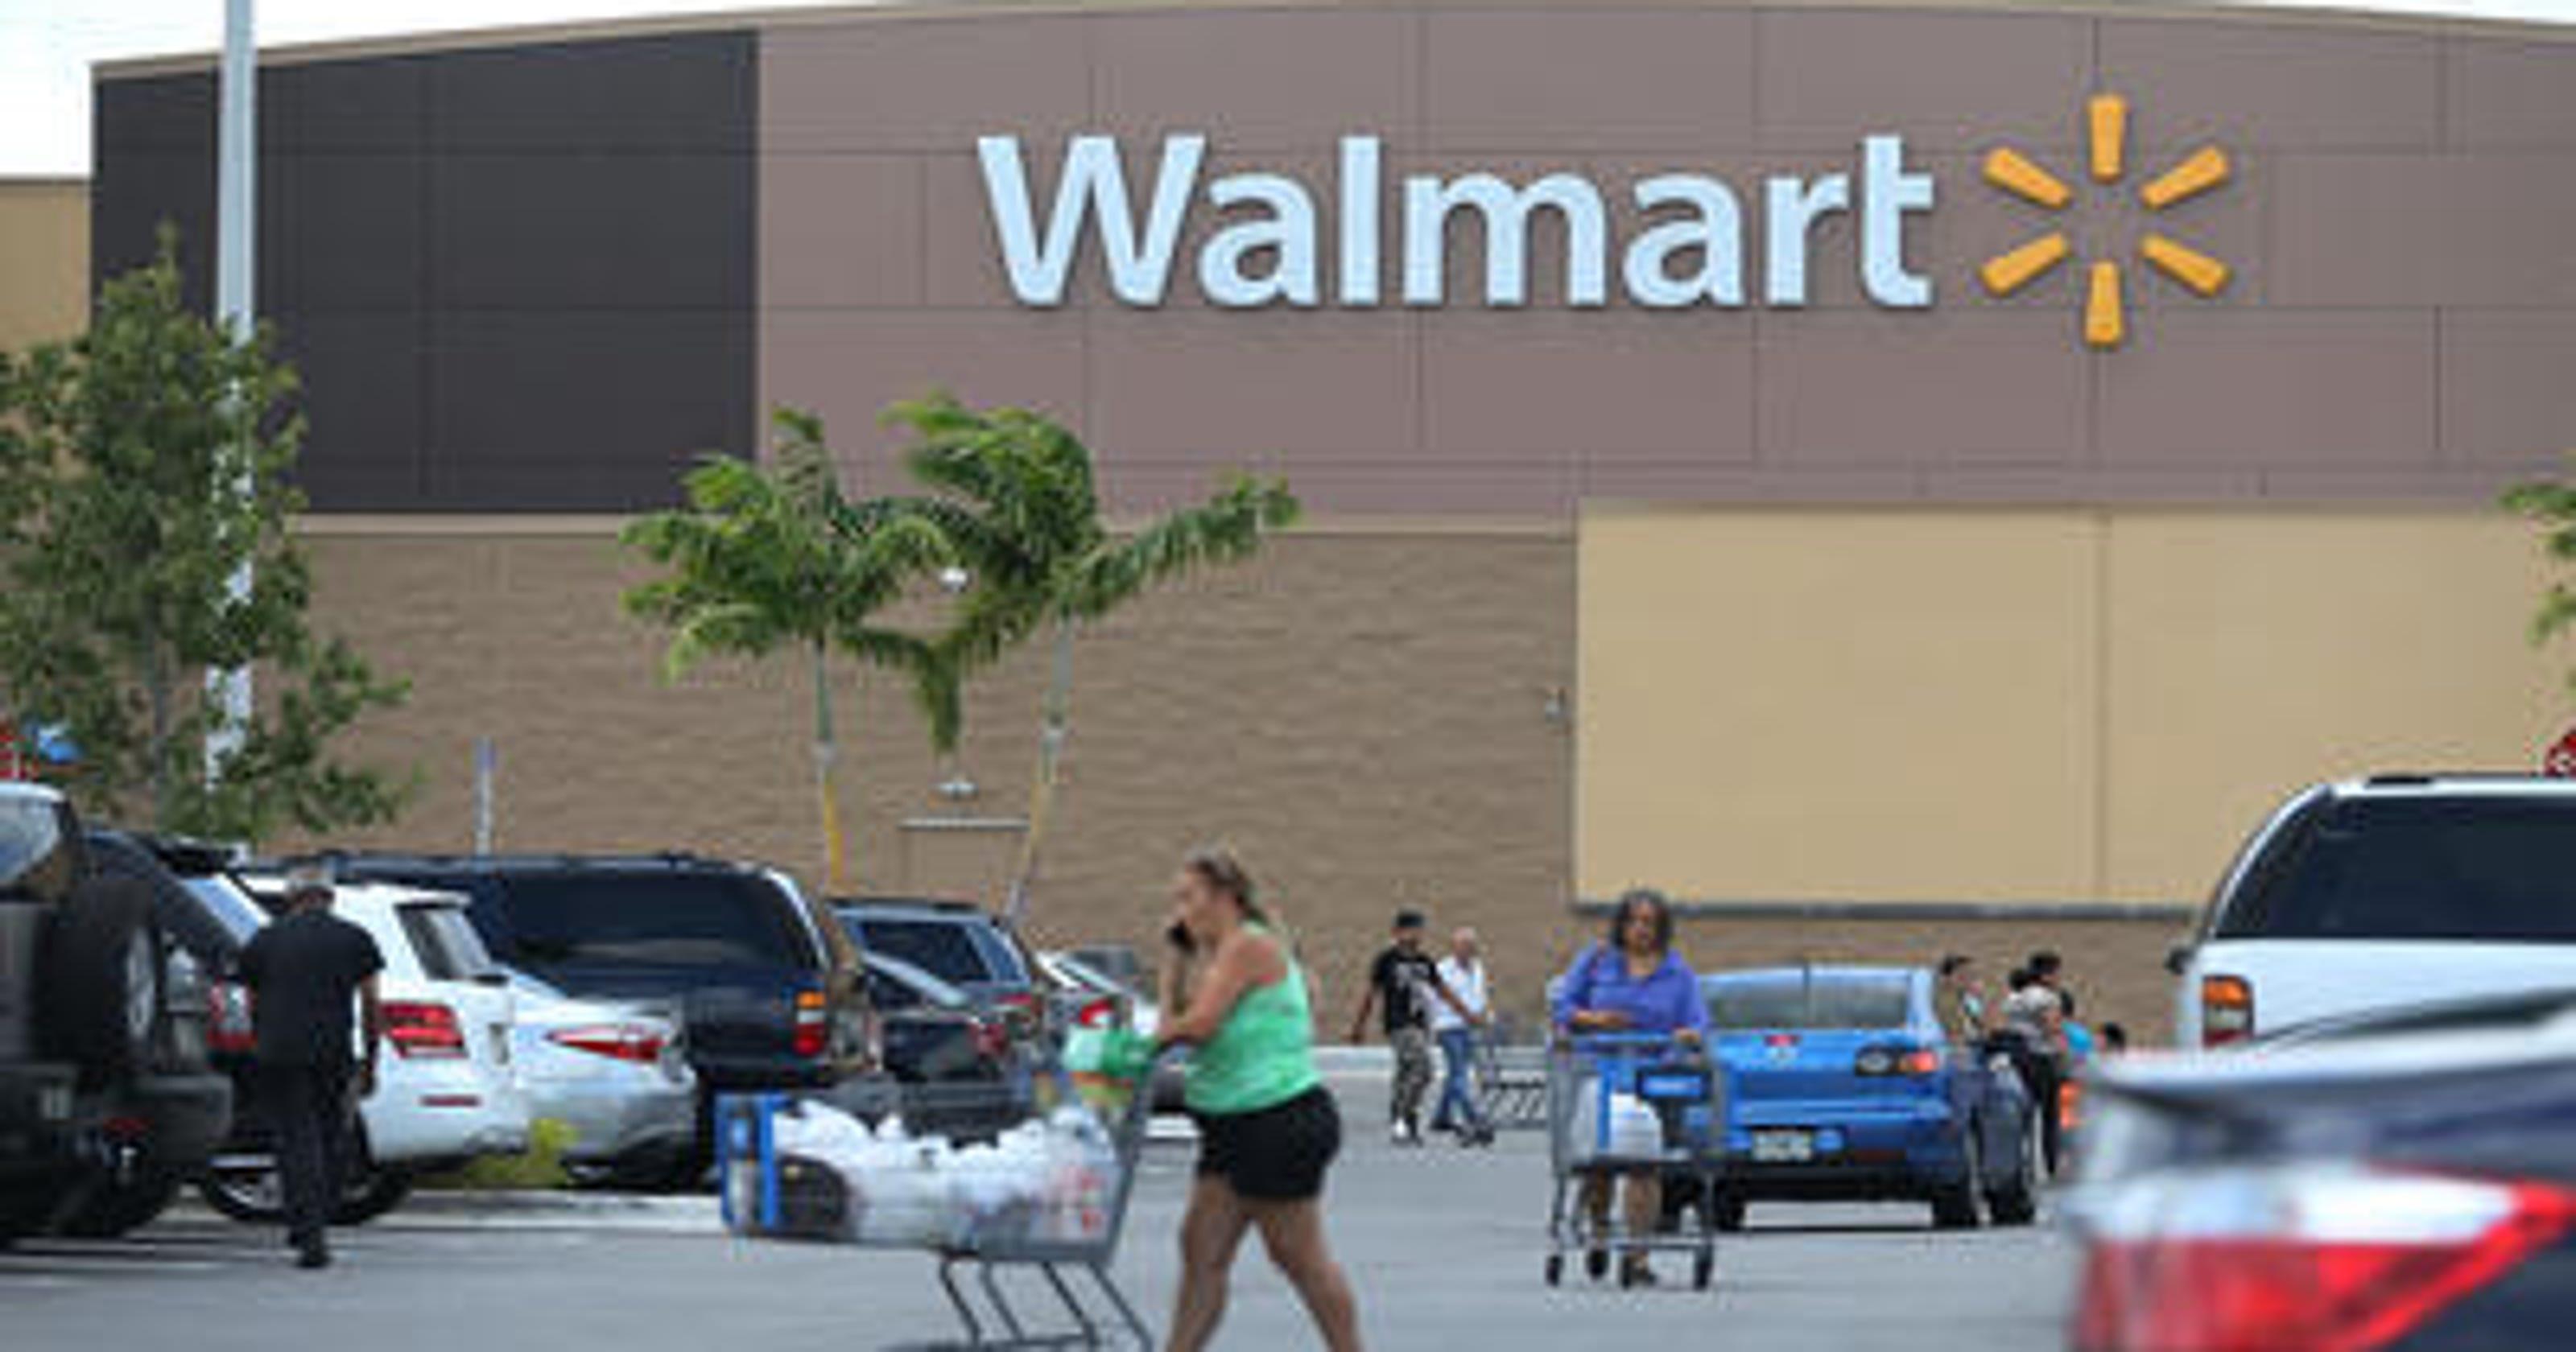 17e41f27c14 Decomposing body found in Palm Bay Walmart parking lot